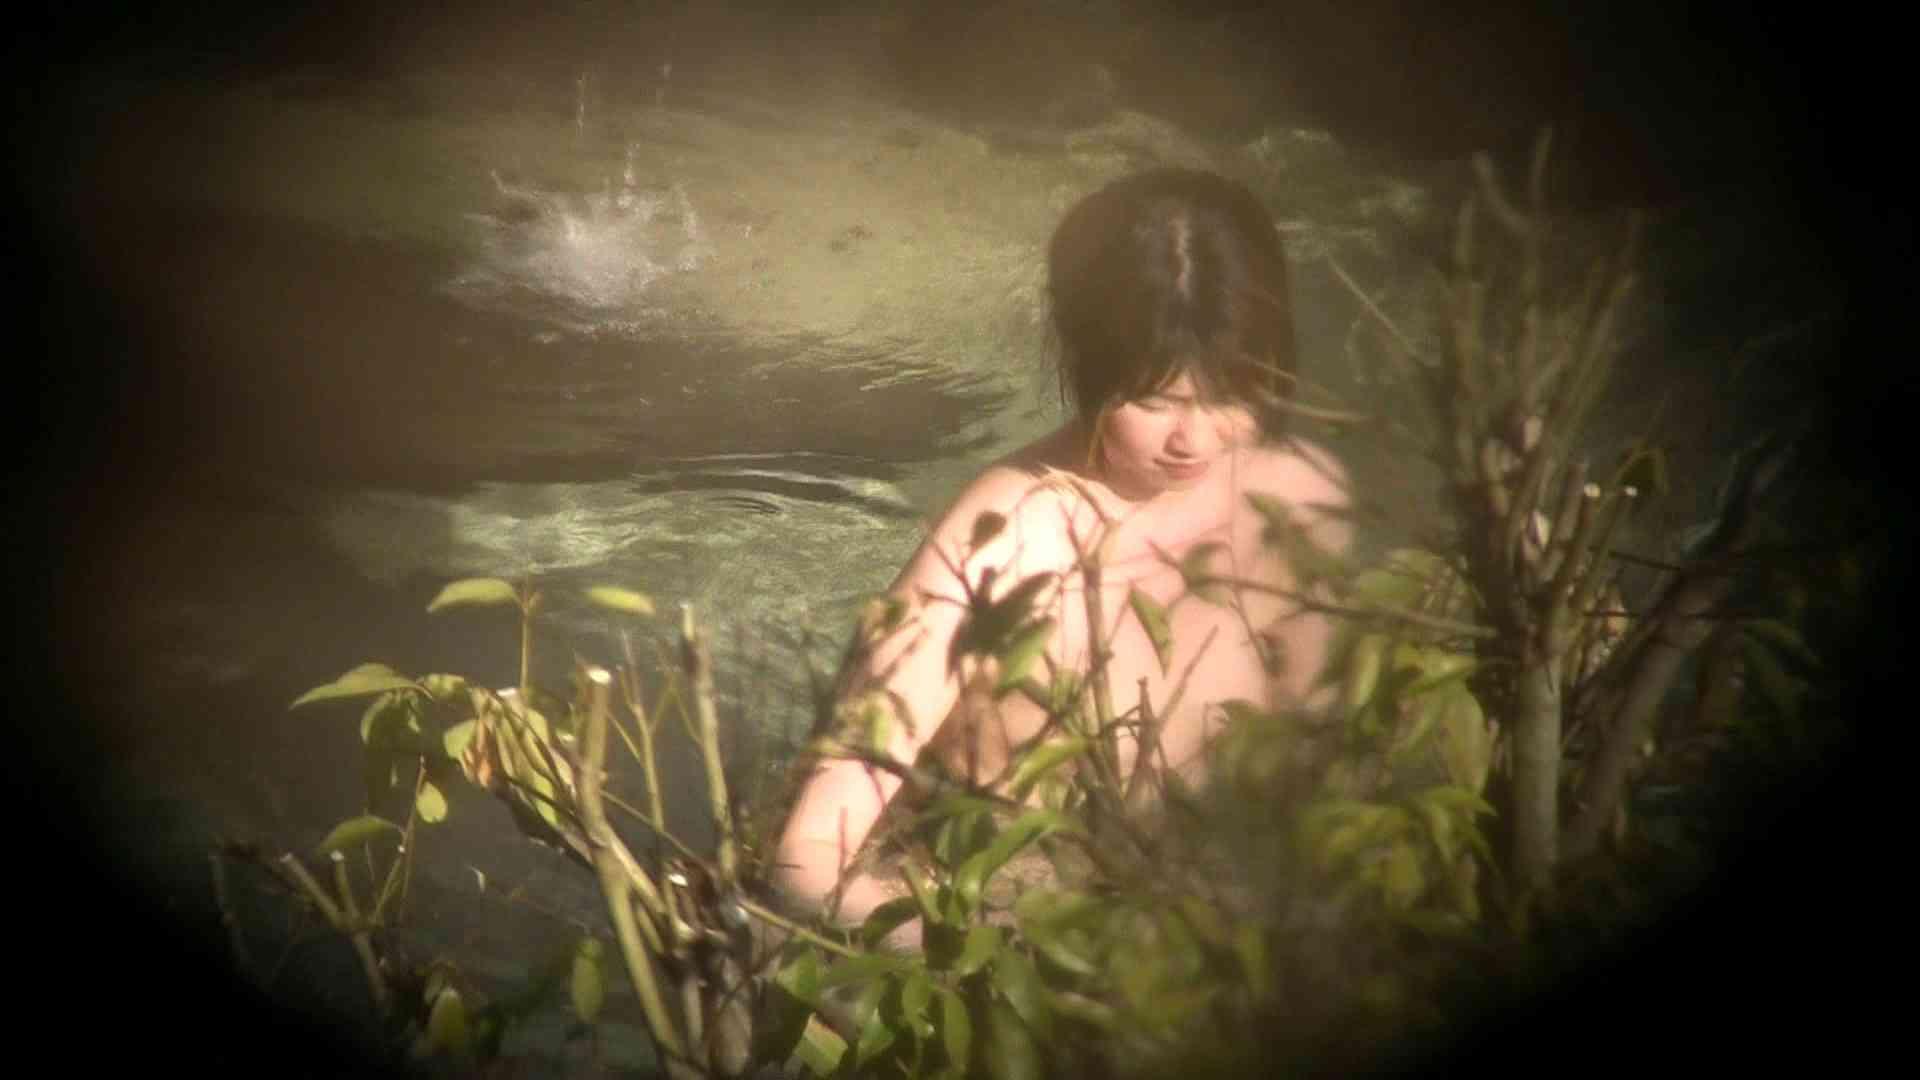 Aquaな露天風呂Vol.698 美しいOLの裸体 われめAV動画紹介 104pic 95